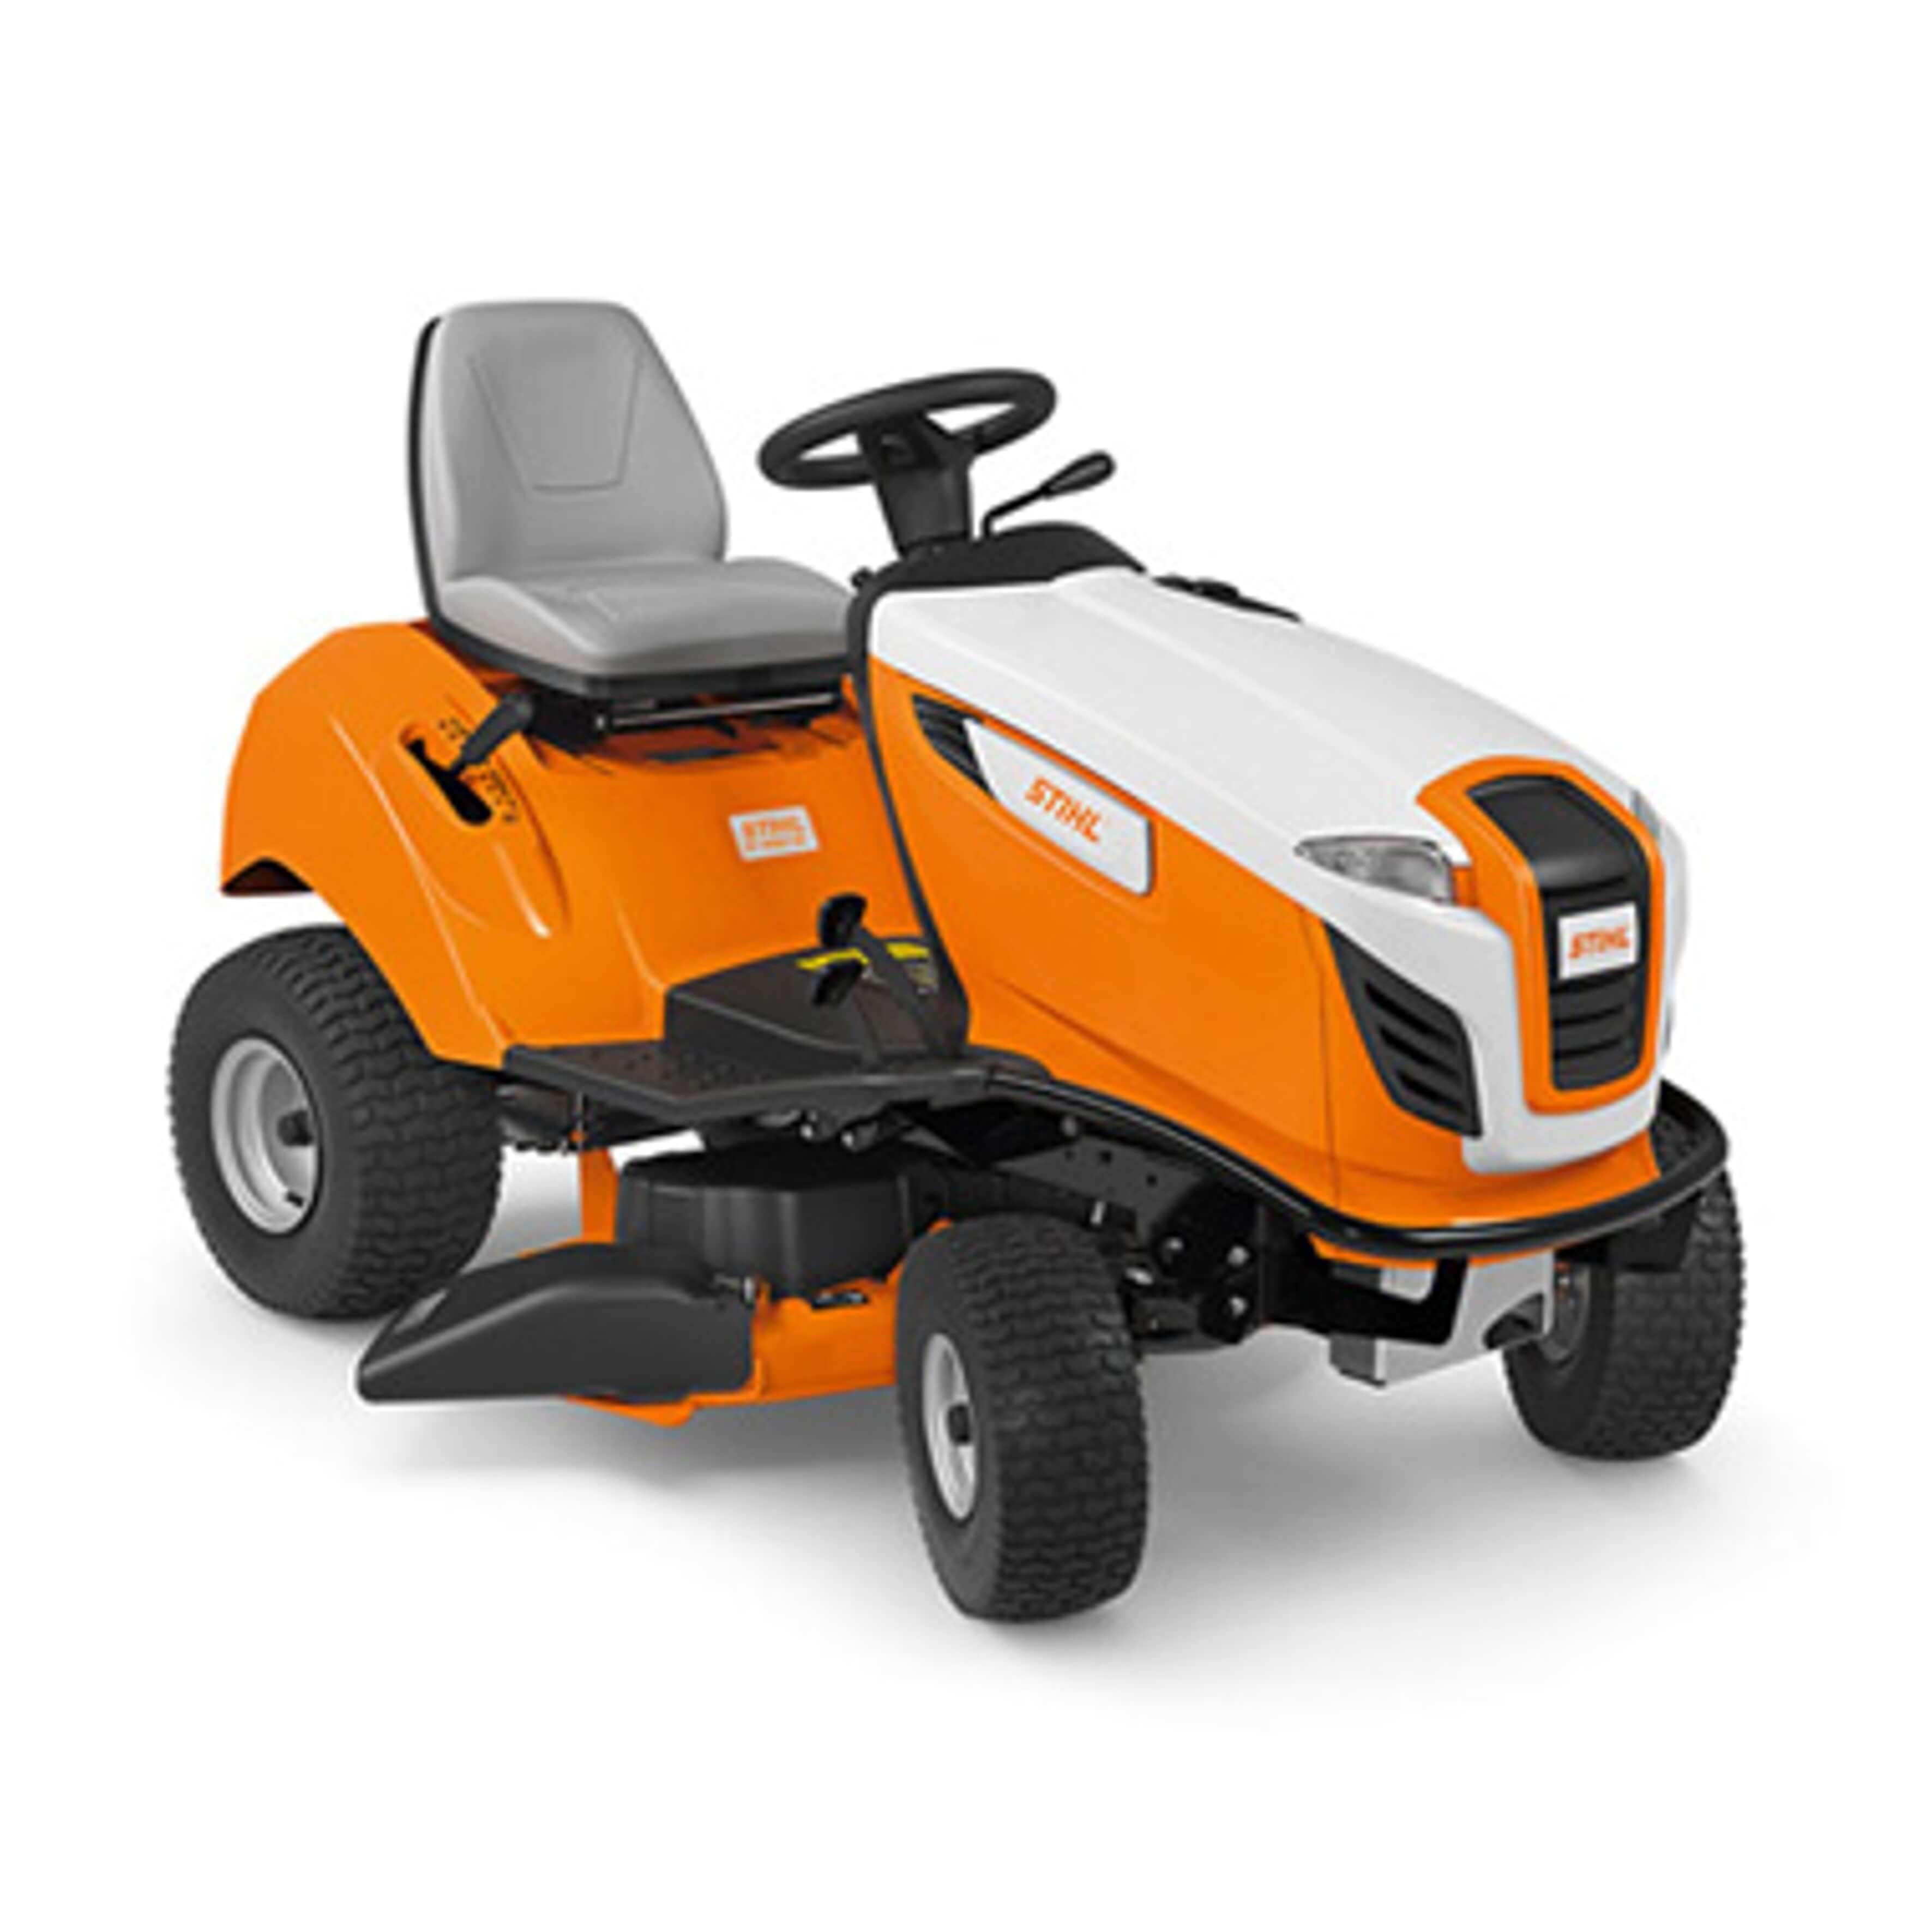 Stihl RT 4097.0 SX Ride on Mower Parts